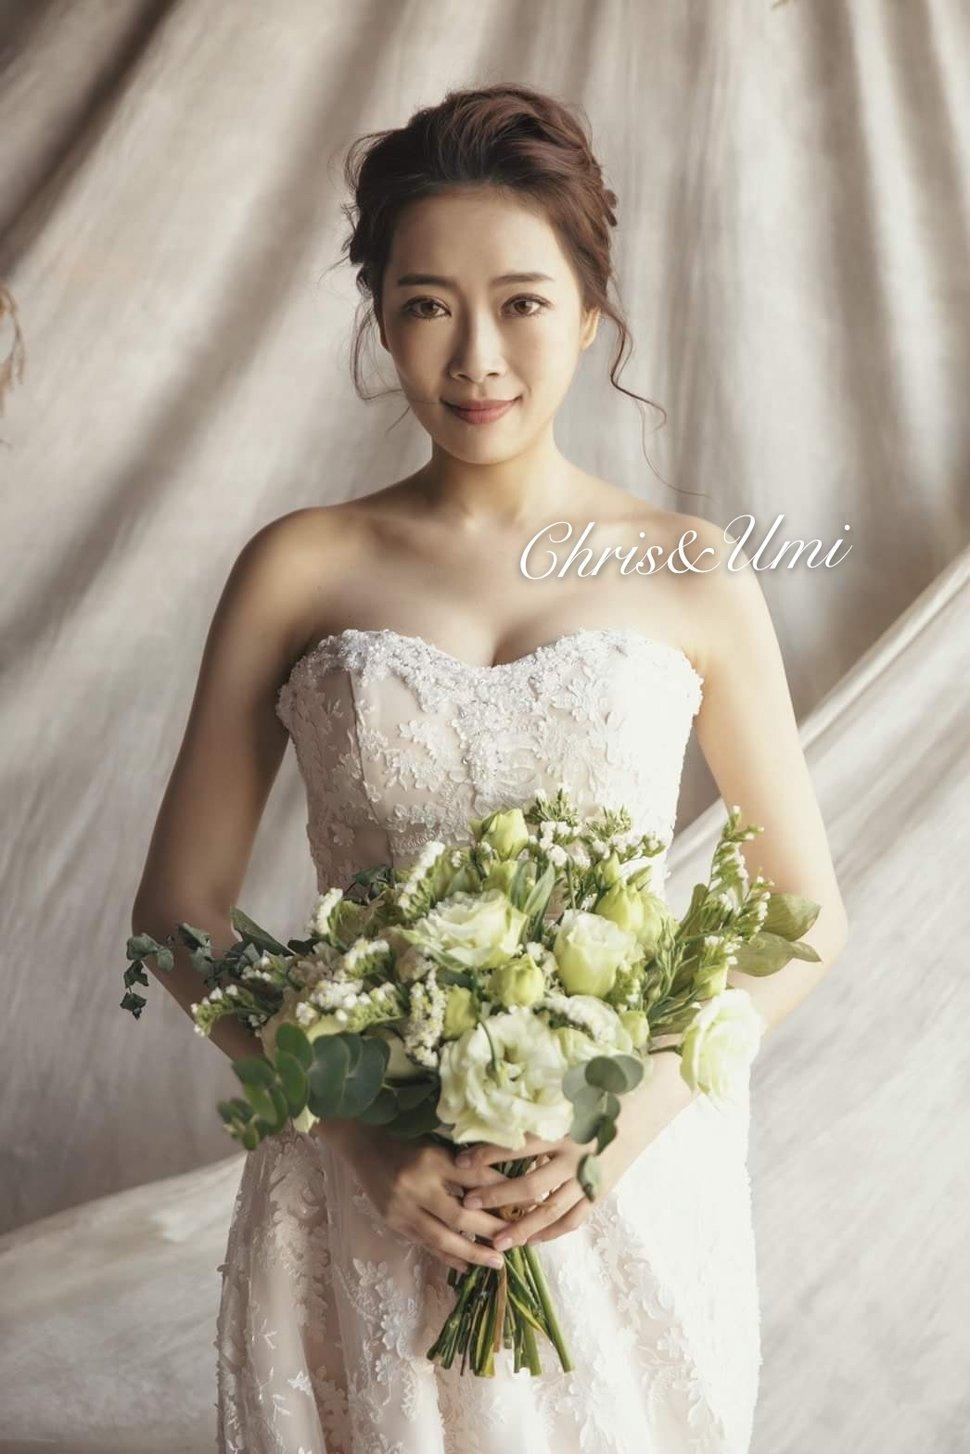 #Chris&Umi全球新秘推薦#與古拉合作拍攝 - Chris han新娘造型《結婚吧》